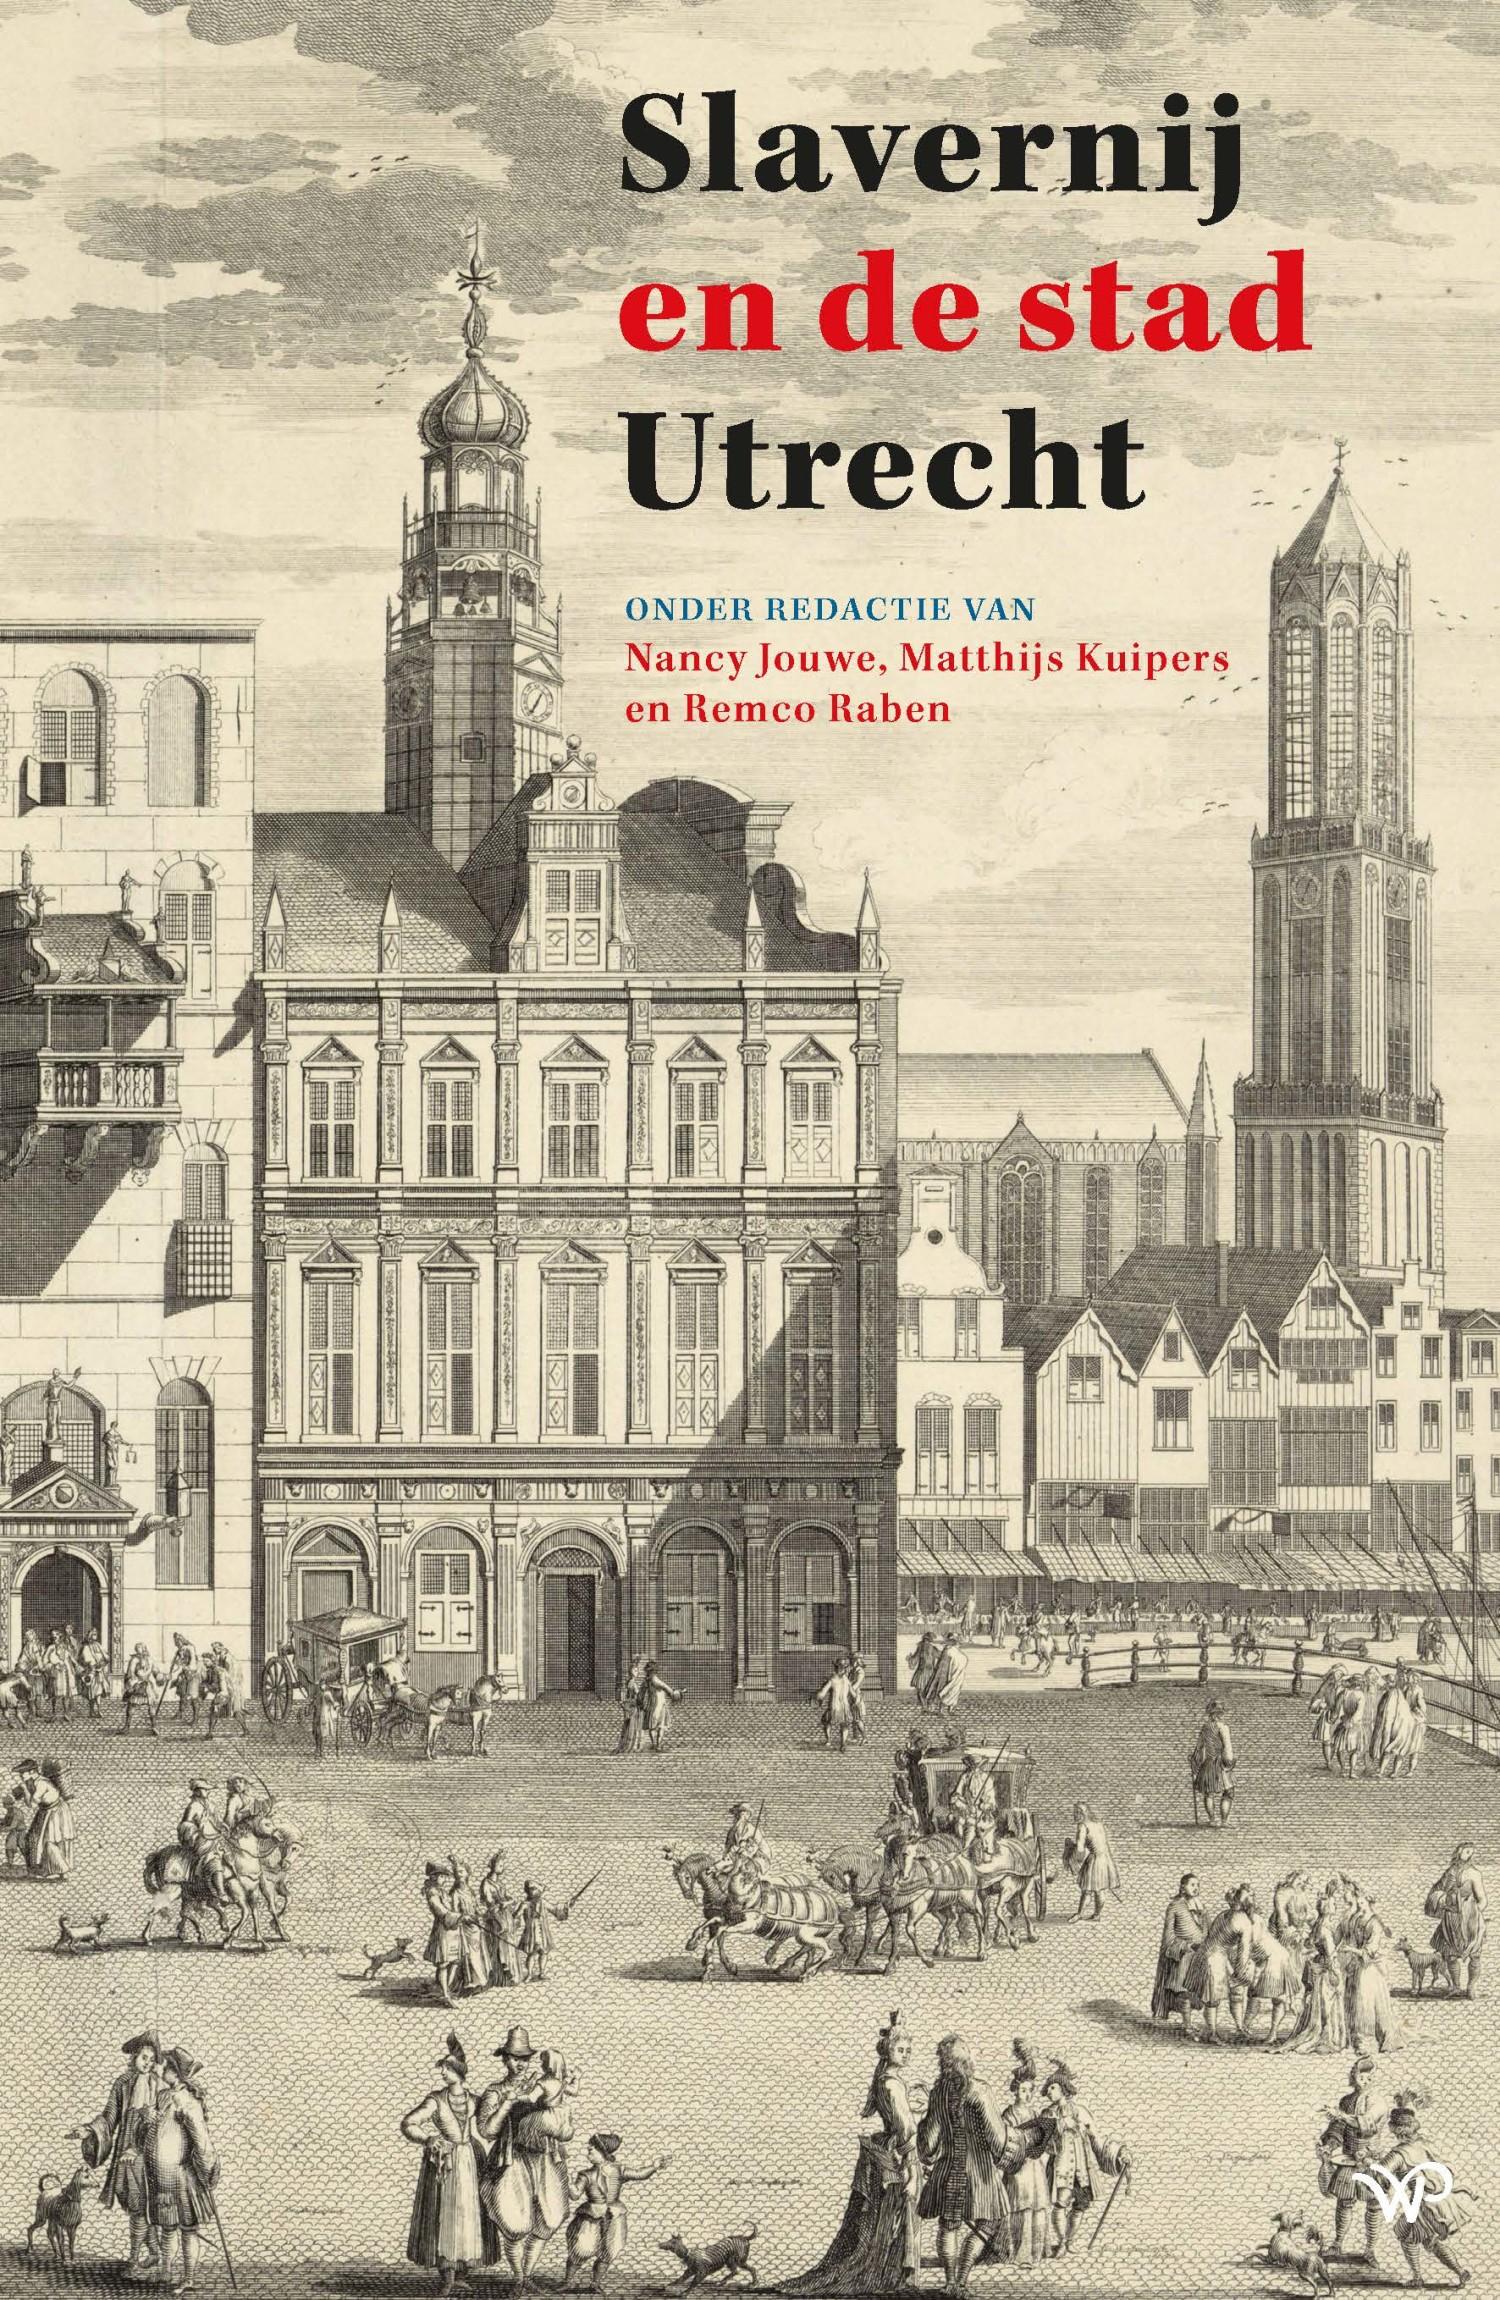 Afbeelding van omslag van boek